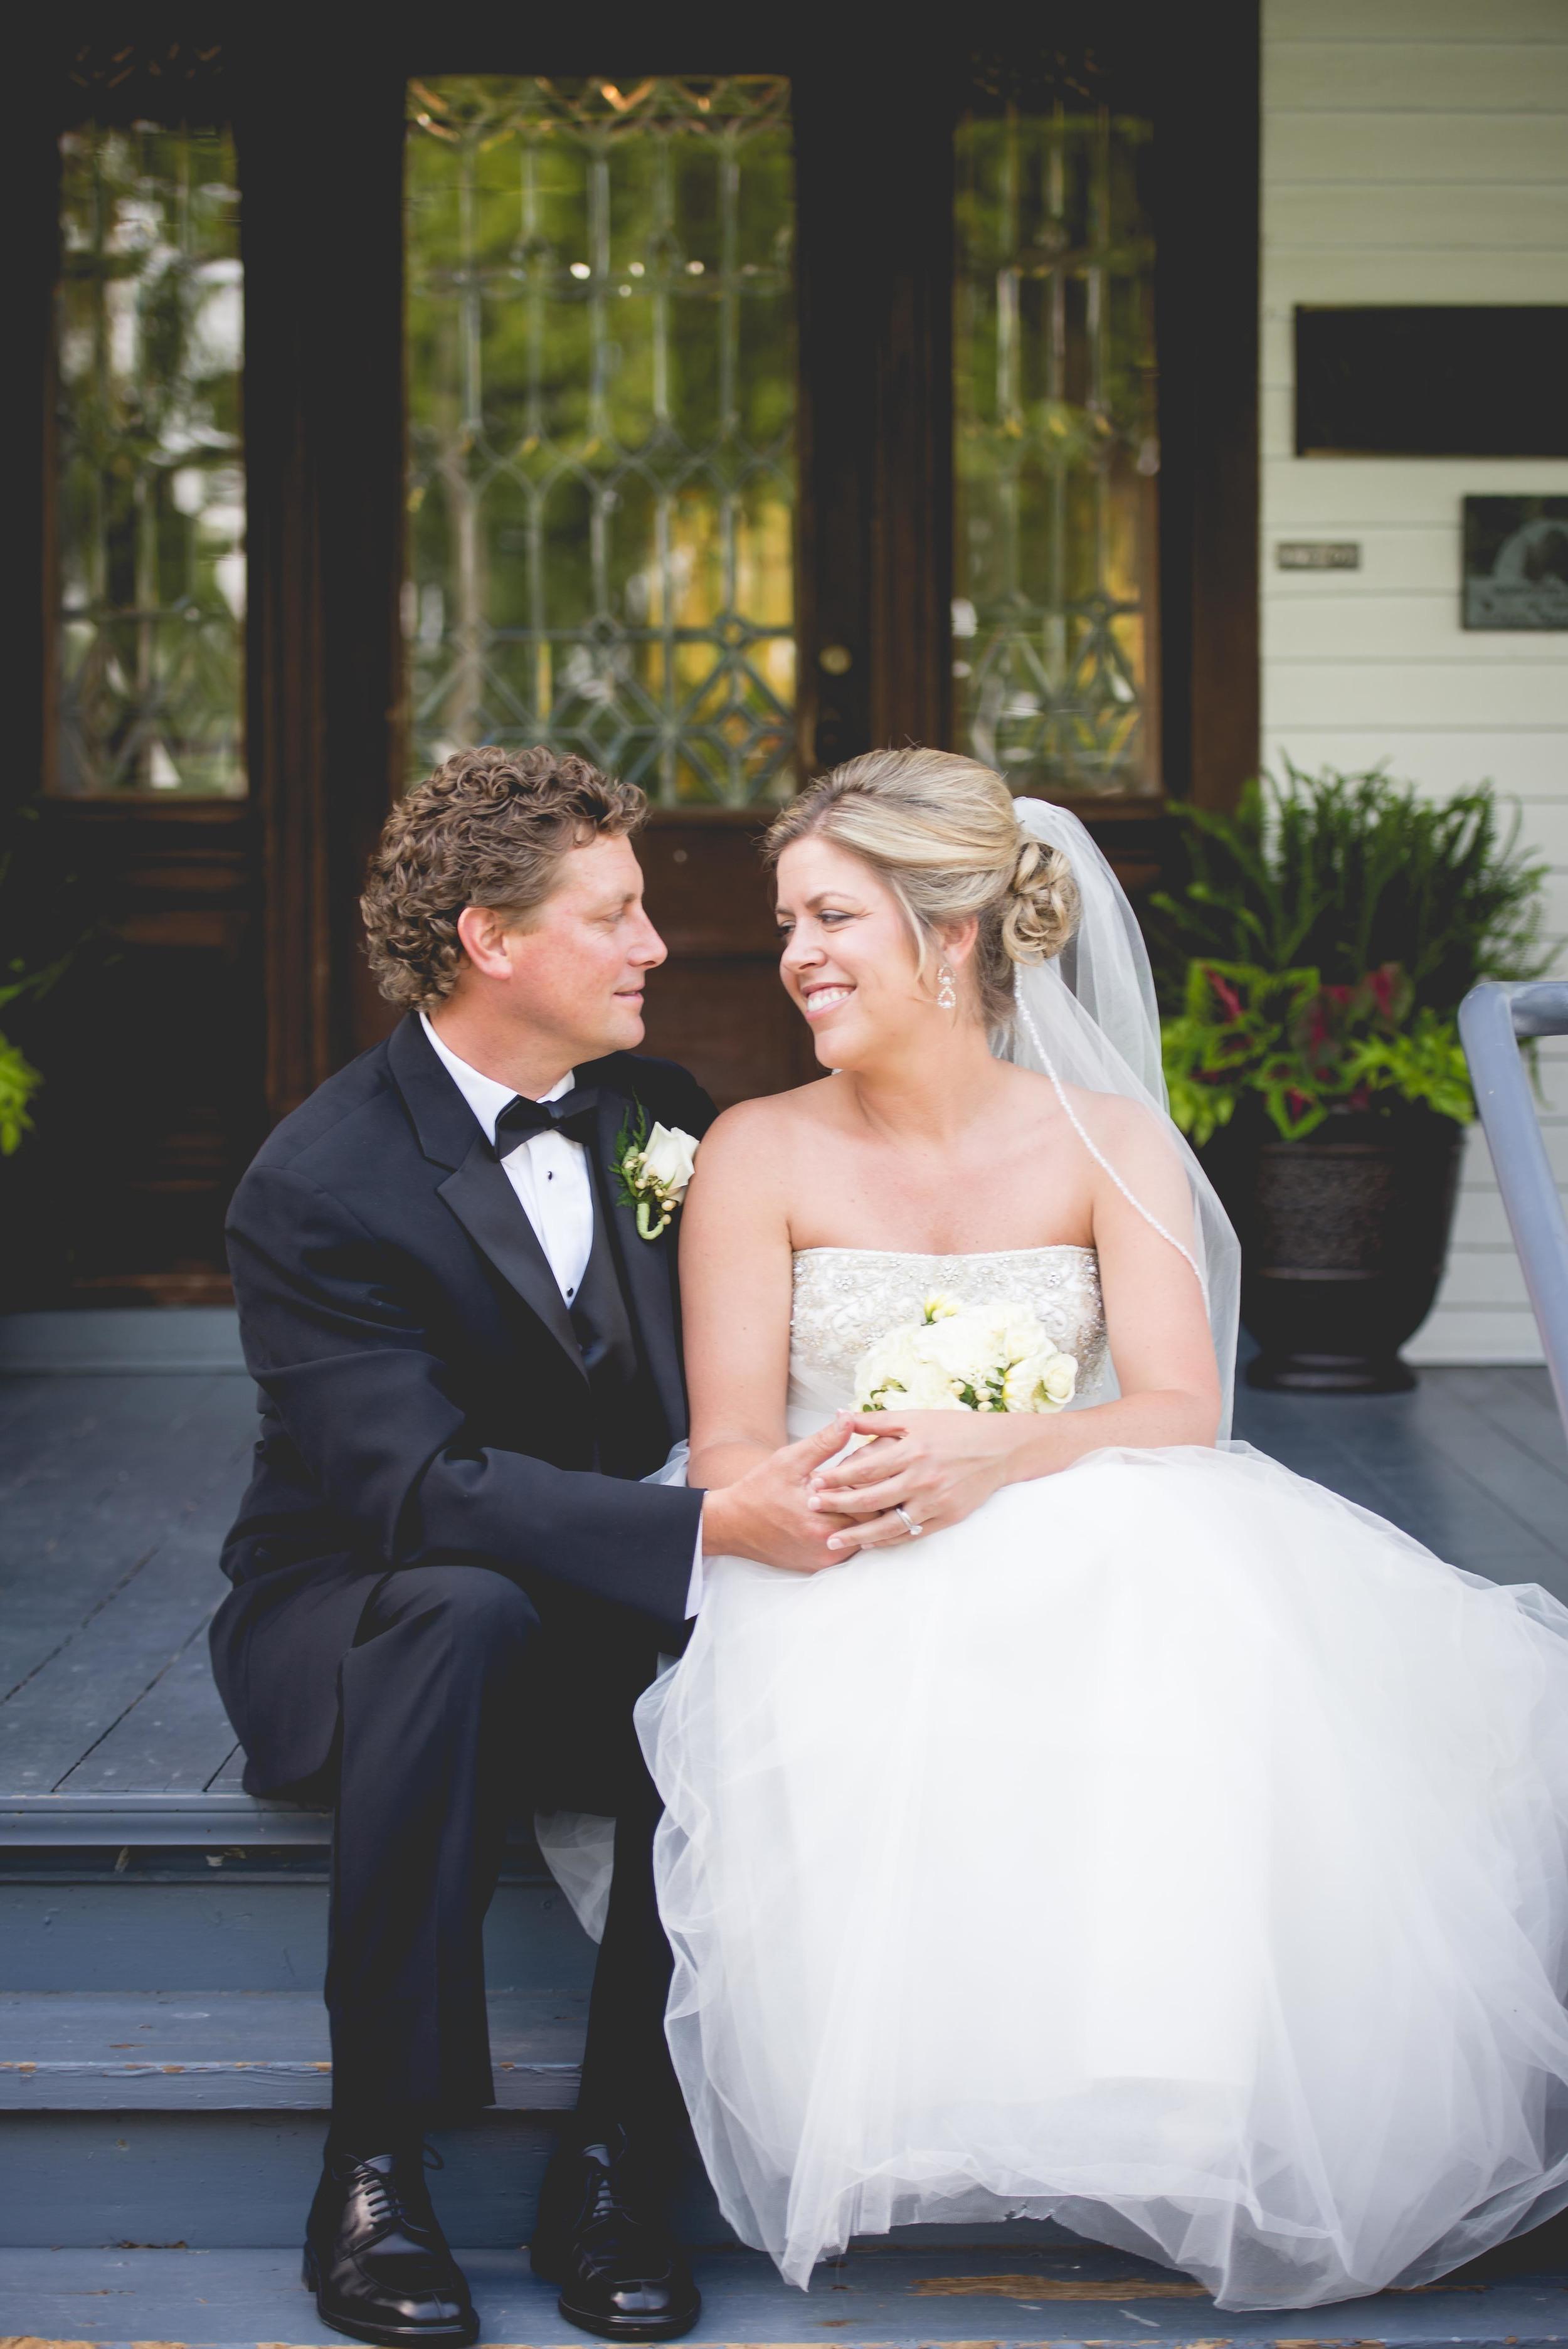 sarasutterphotography_leeandshalon_wedding_2015-612.jpg